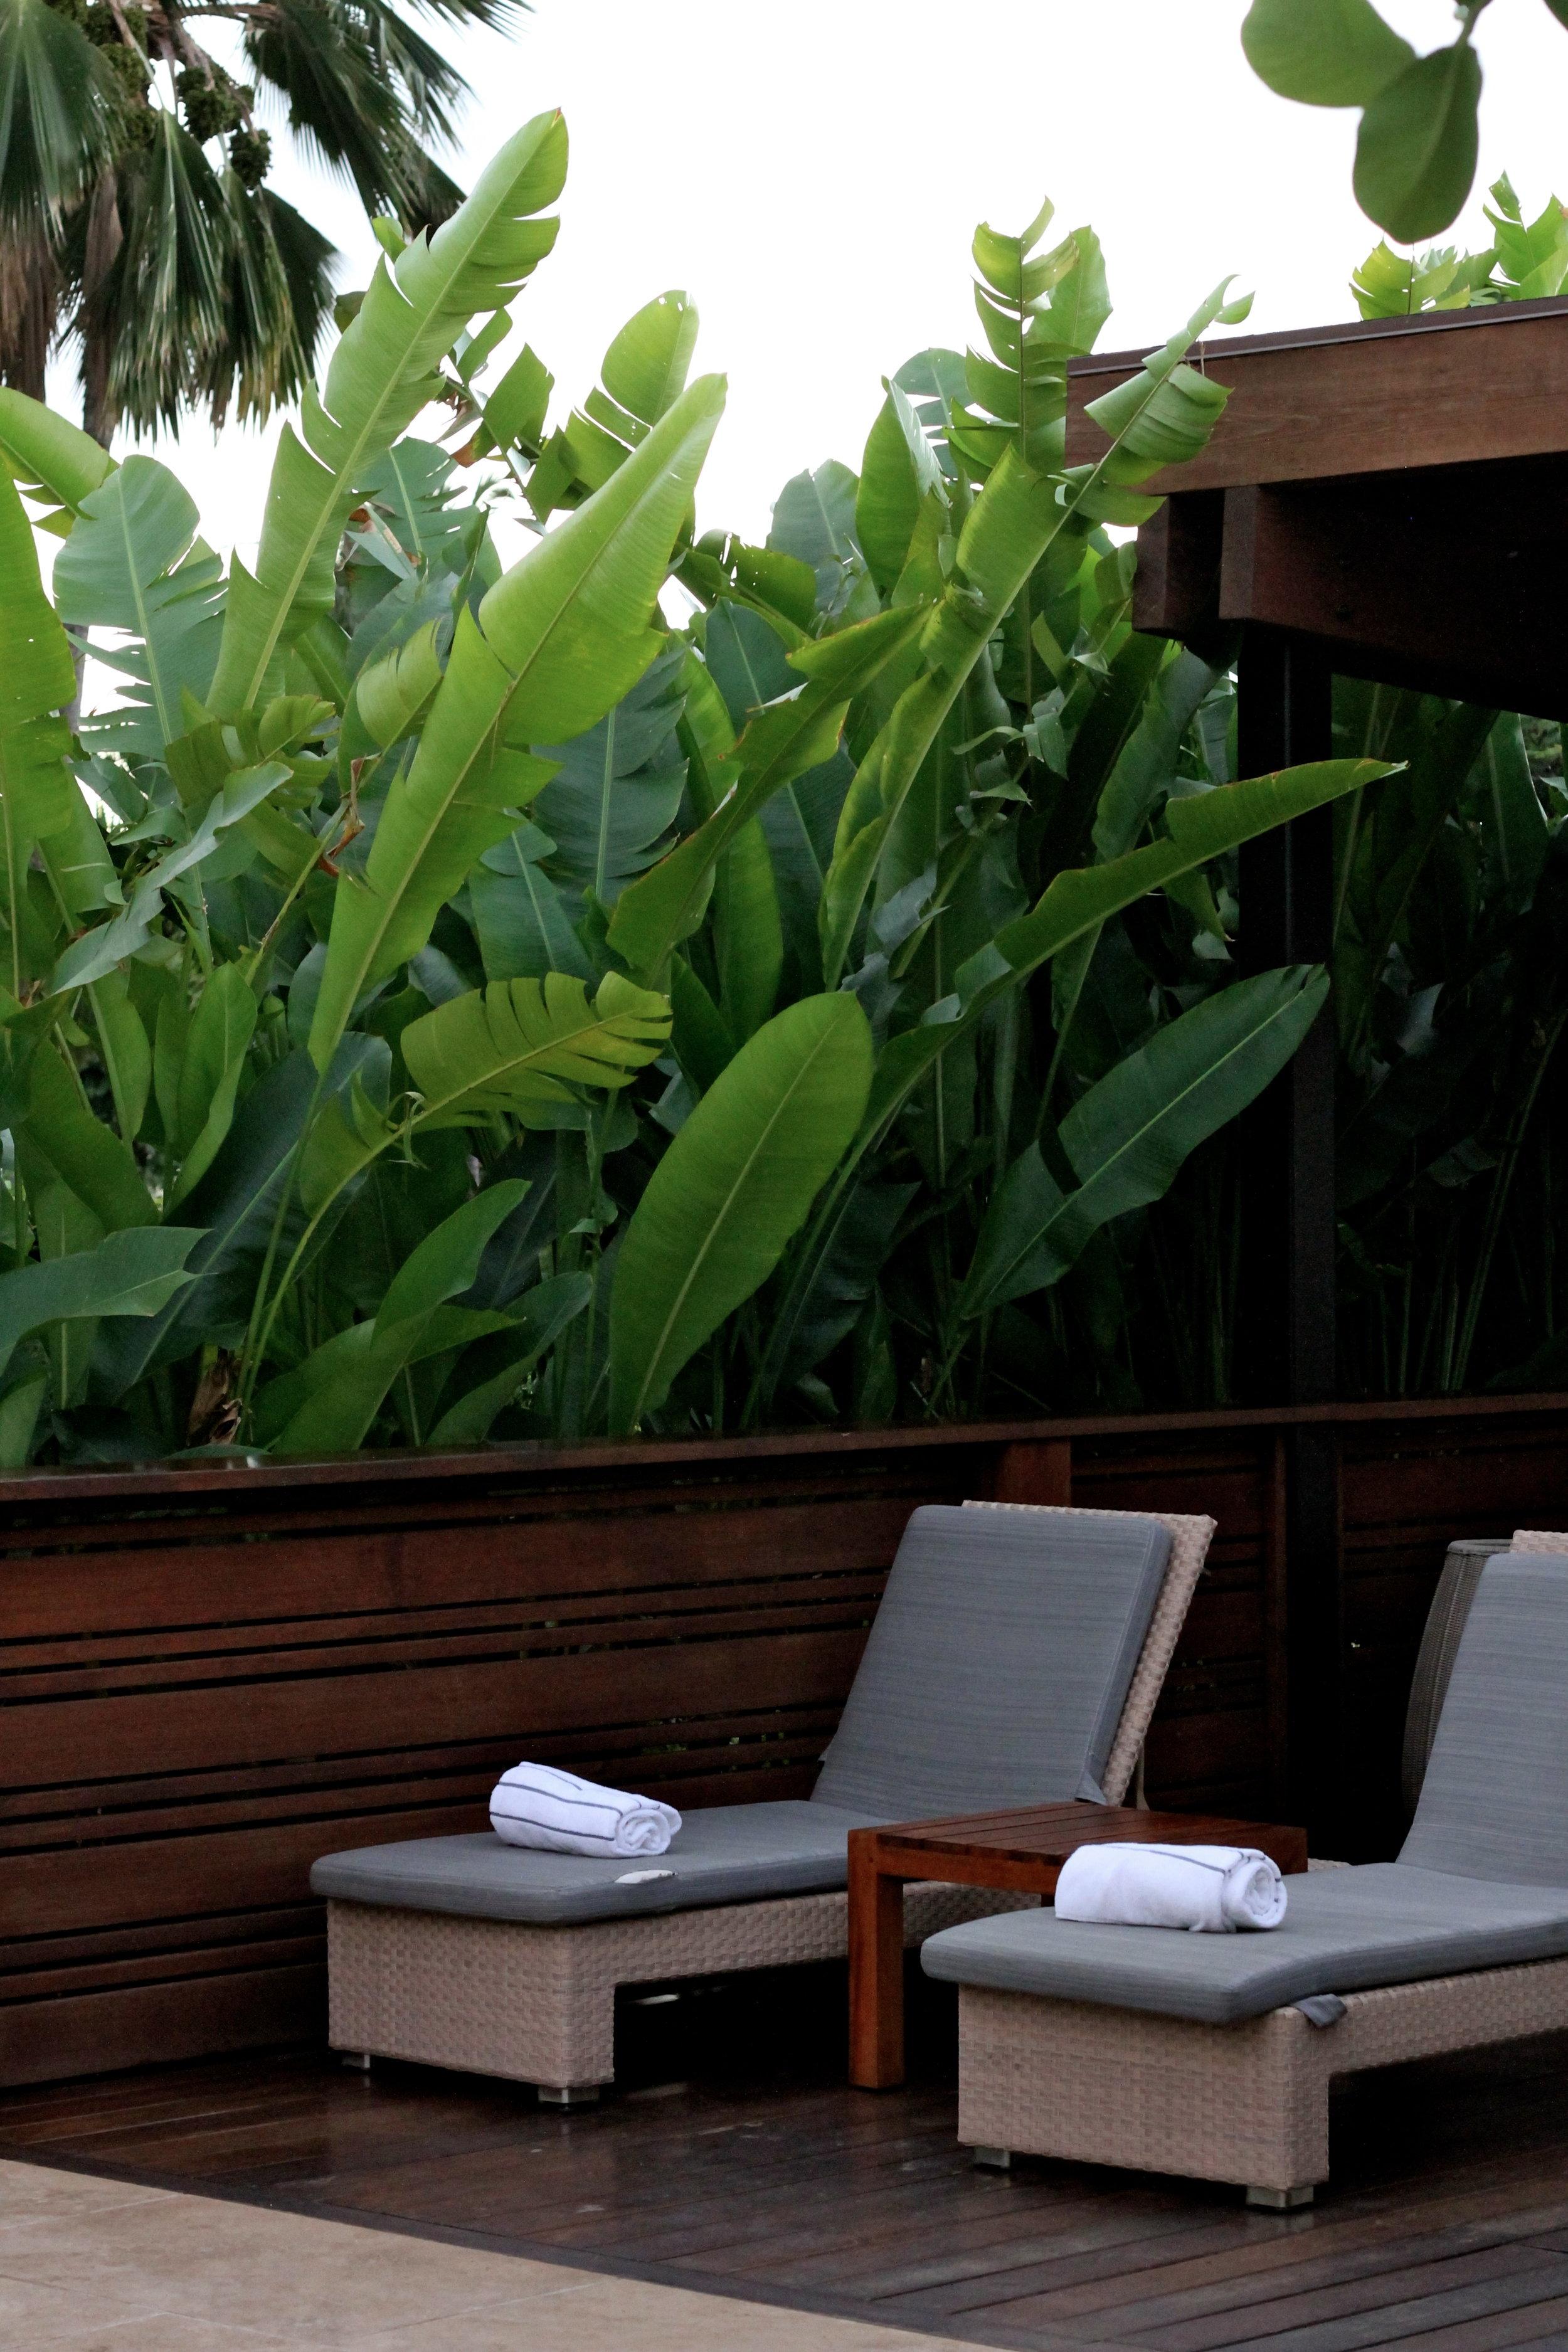 Hotel Wailea, Maui, Hawaii